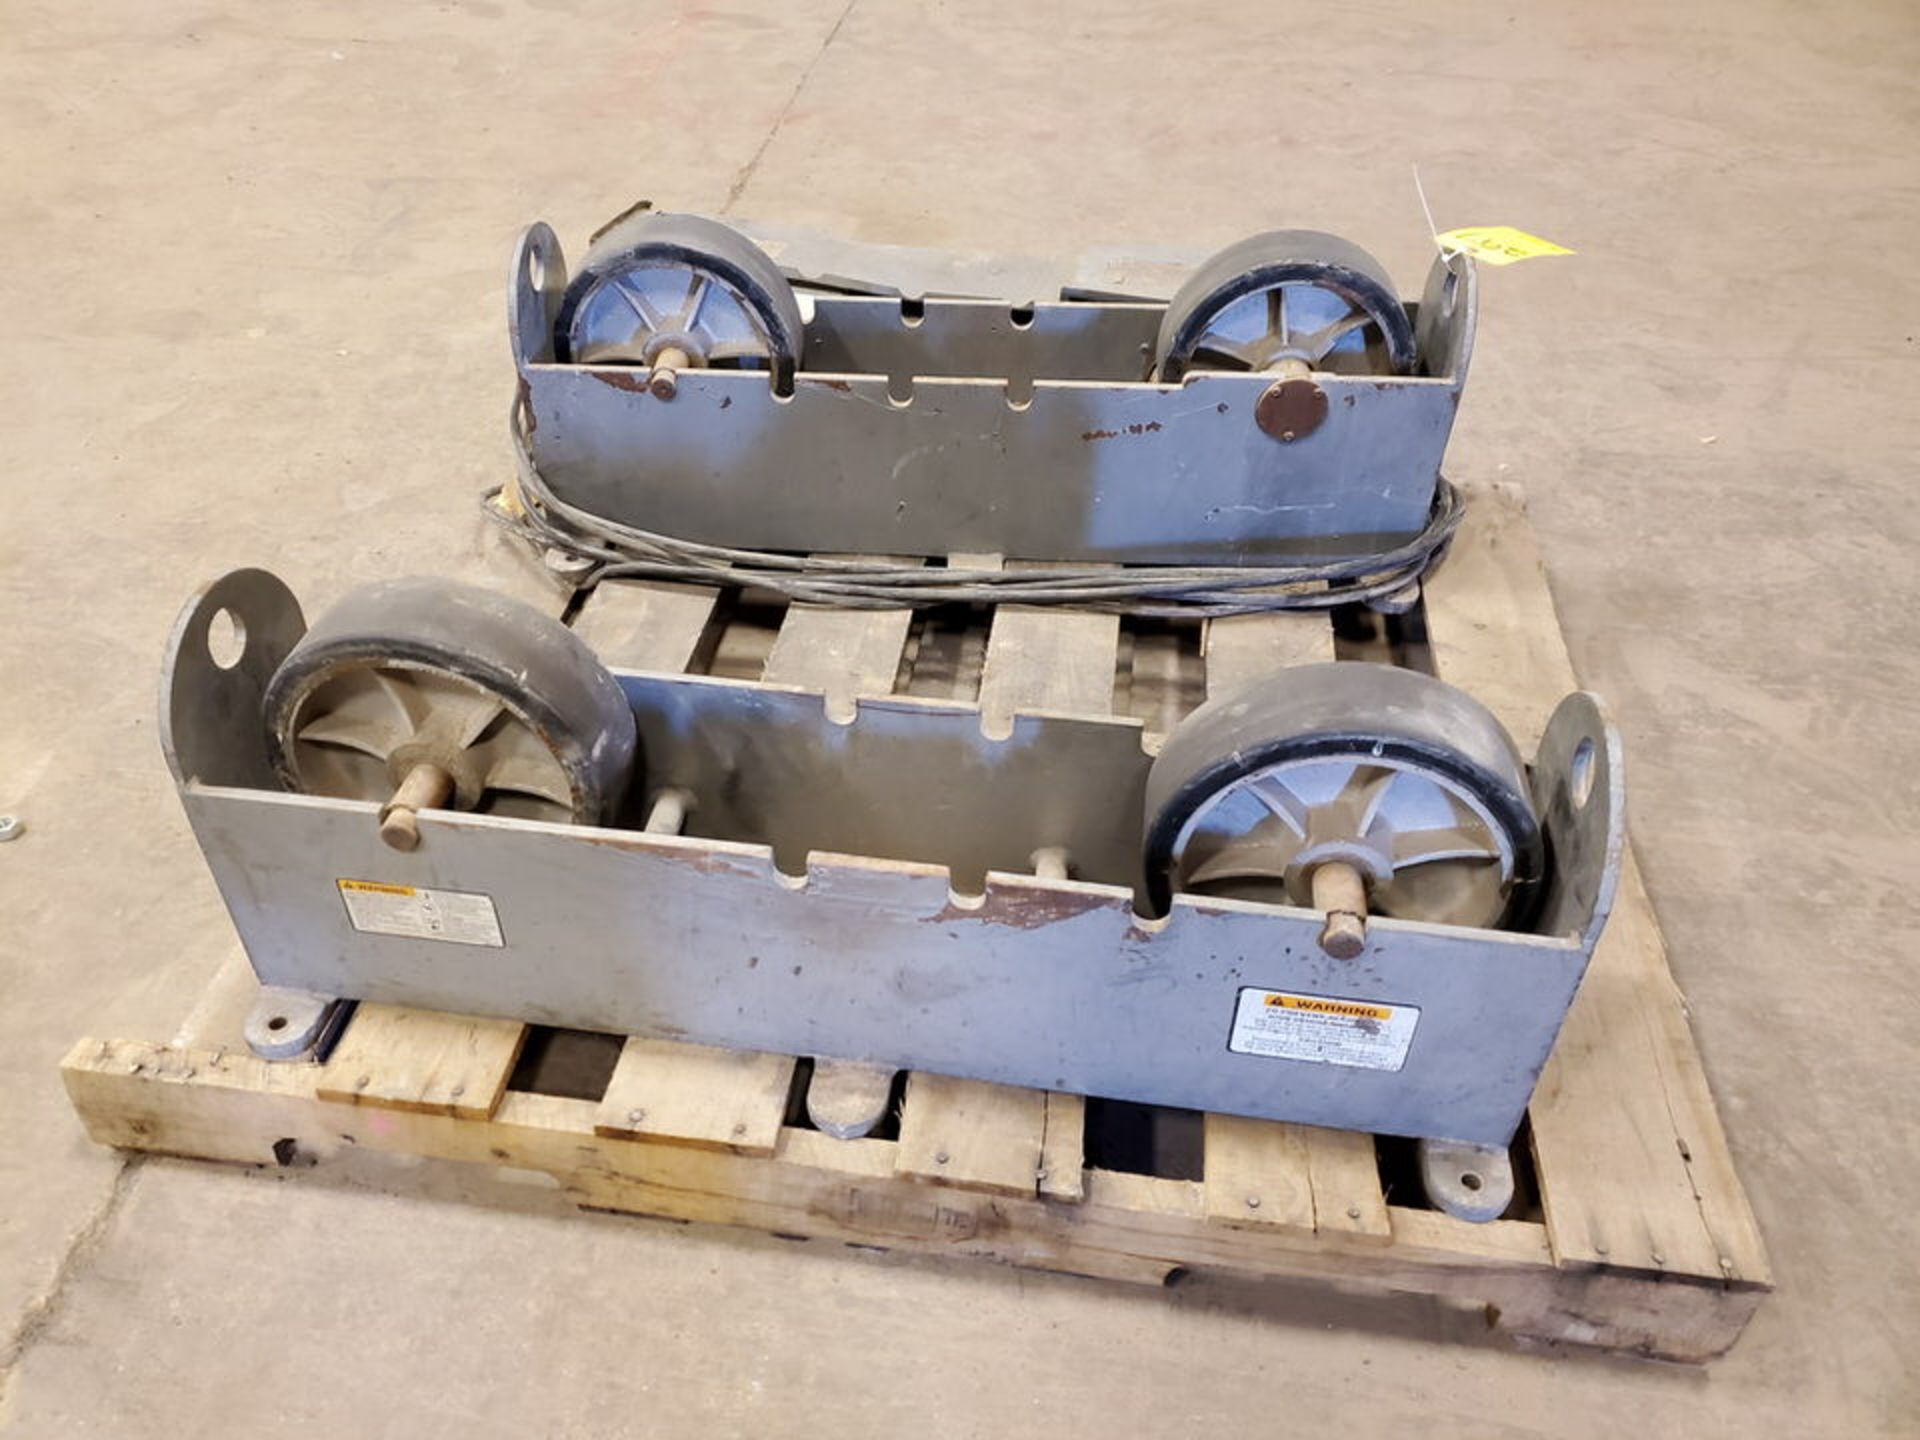 "Profax TR-5000 Turn Roll 5K Cap., 115V, 10A, 50/60HZ, 1PH, RPM: 0-5; 3"" Wheel Dia. - Image 4 of 7"